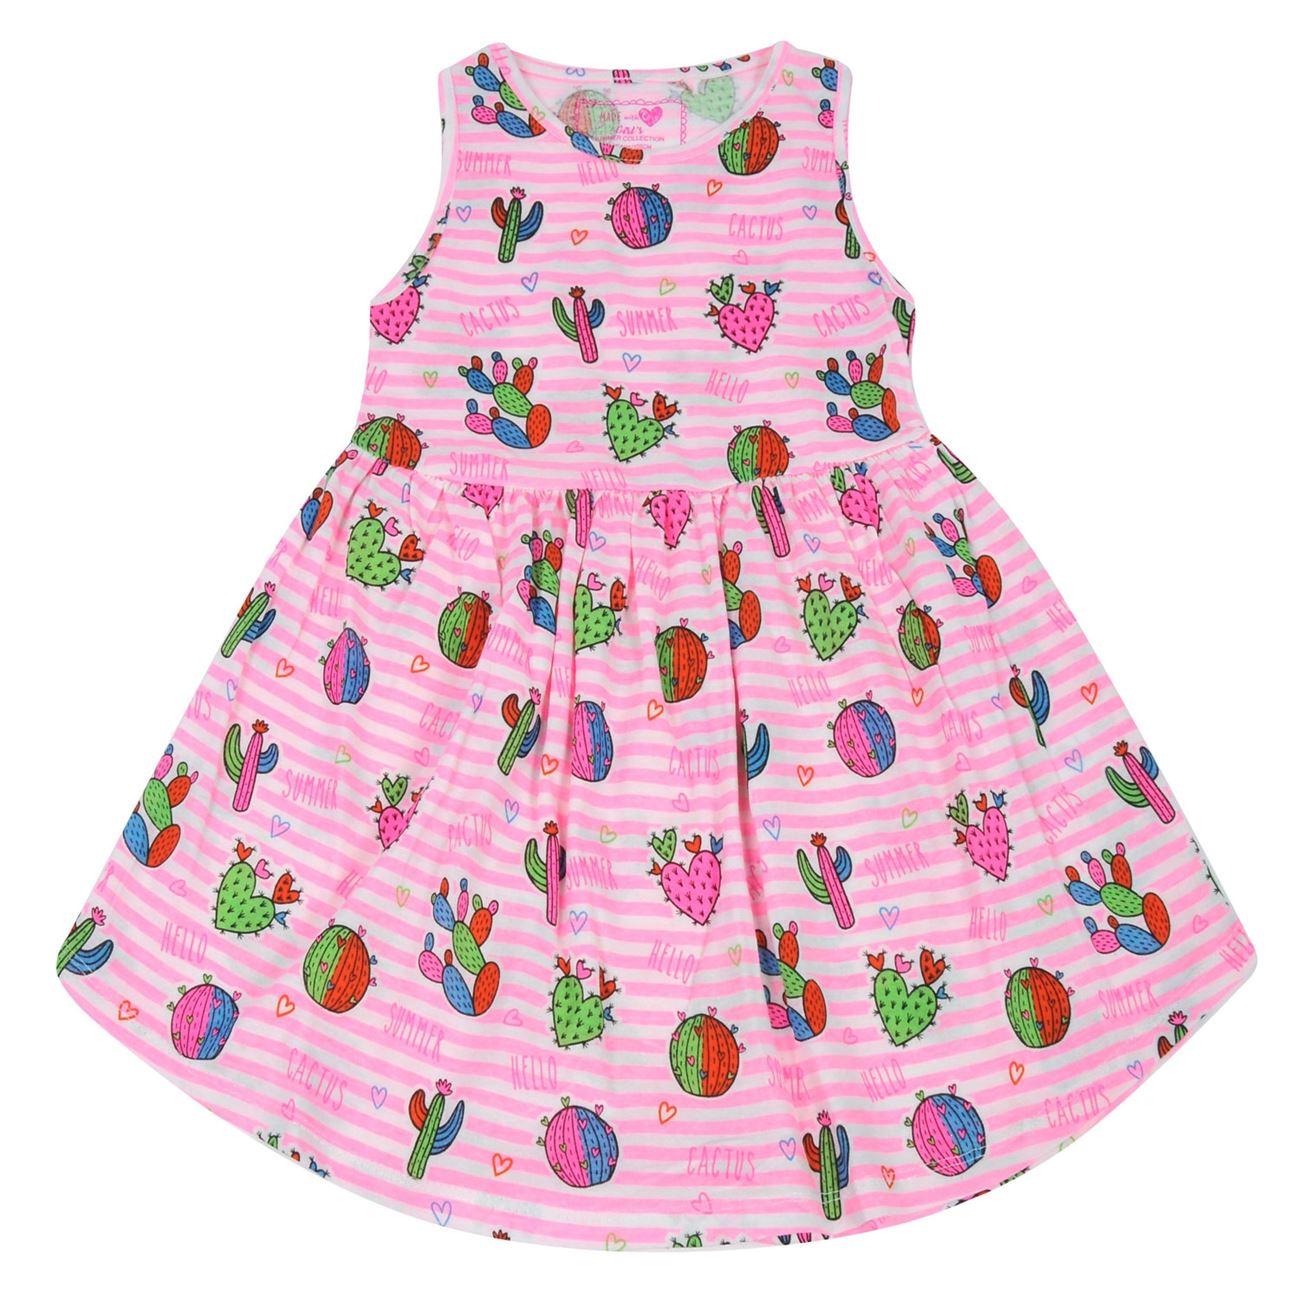 a505ae02b20 Φόρεμα Αμάνικο Παιδικό Ροζ Ριγέ Κάκτοι < Φορέματα για Κορίτσια | Jumbo